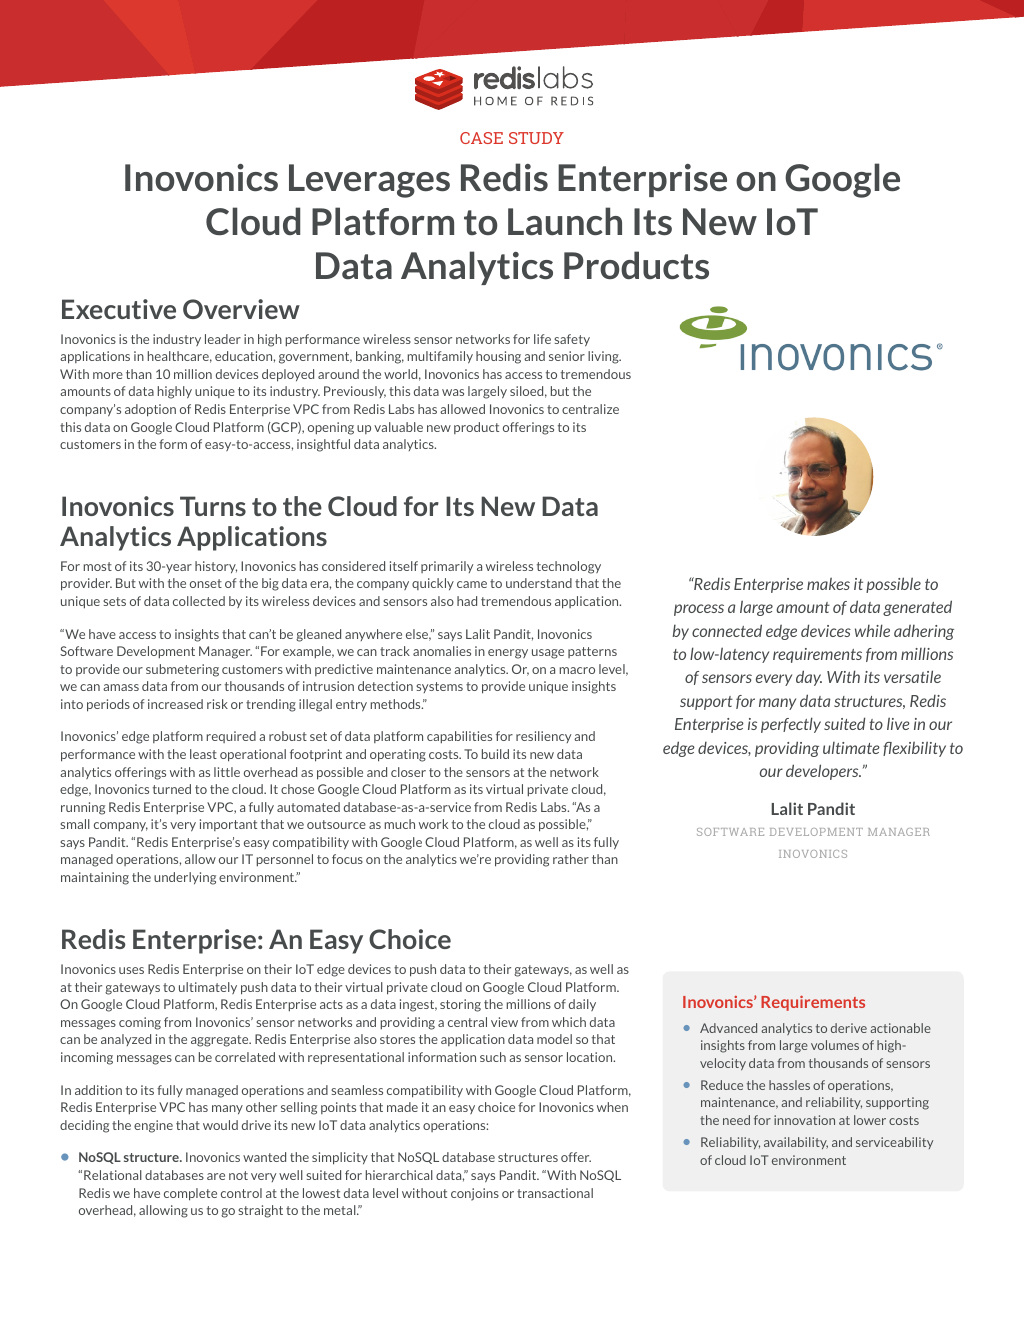 Inovonics Leverages Redis Enterprise on Google Cloud Platform to